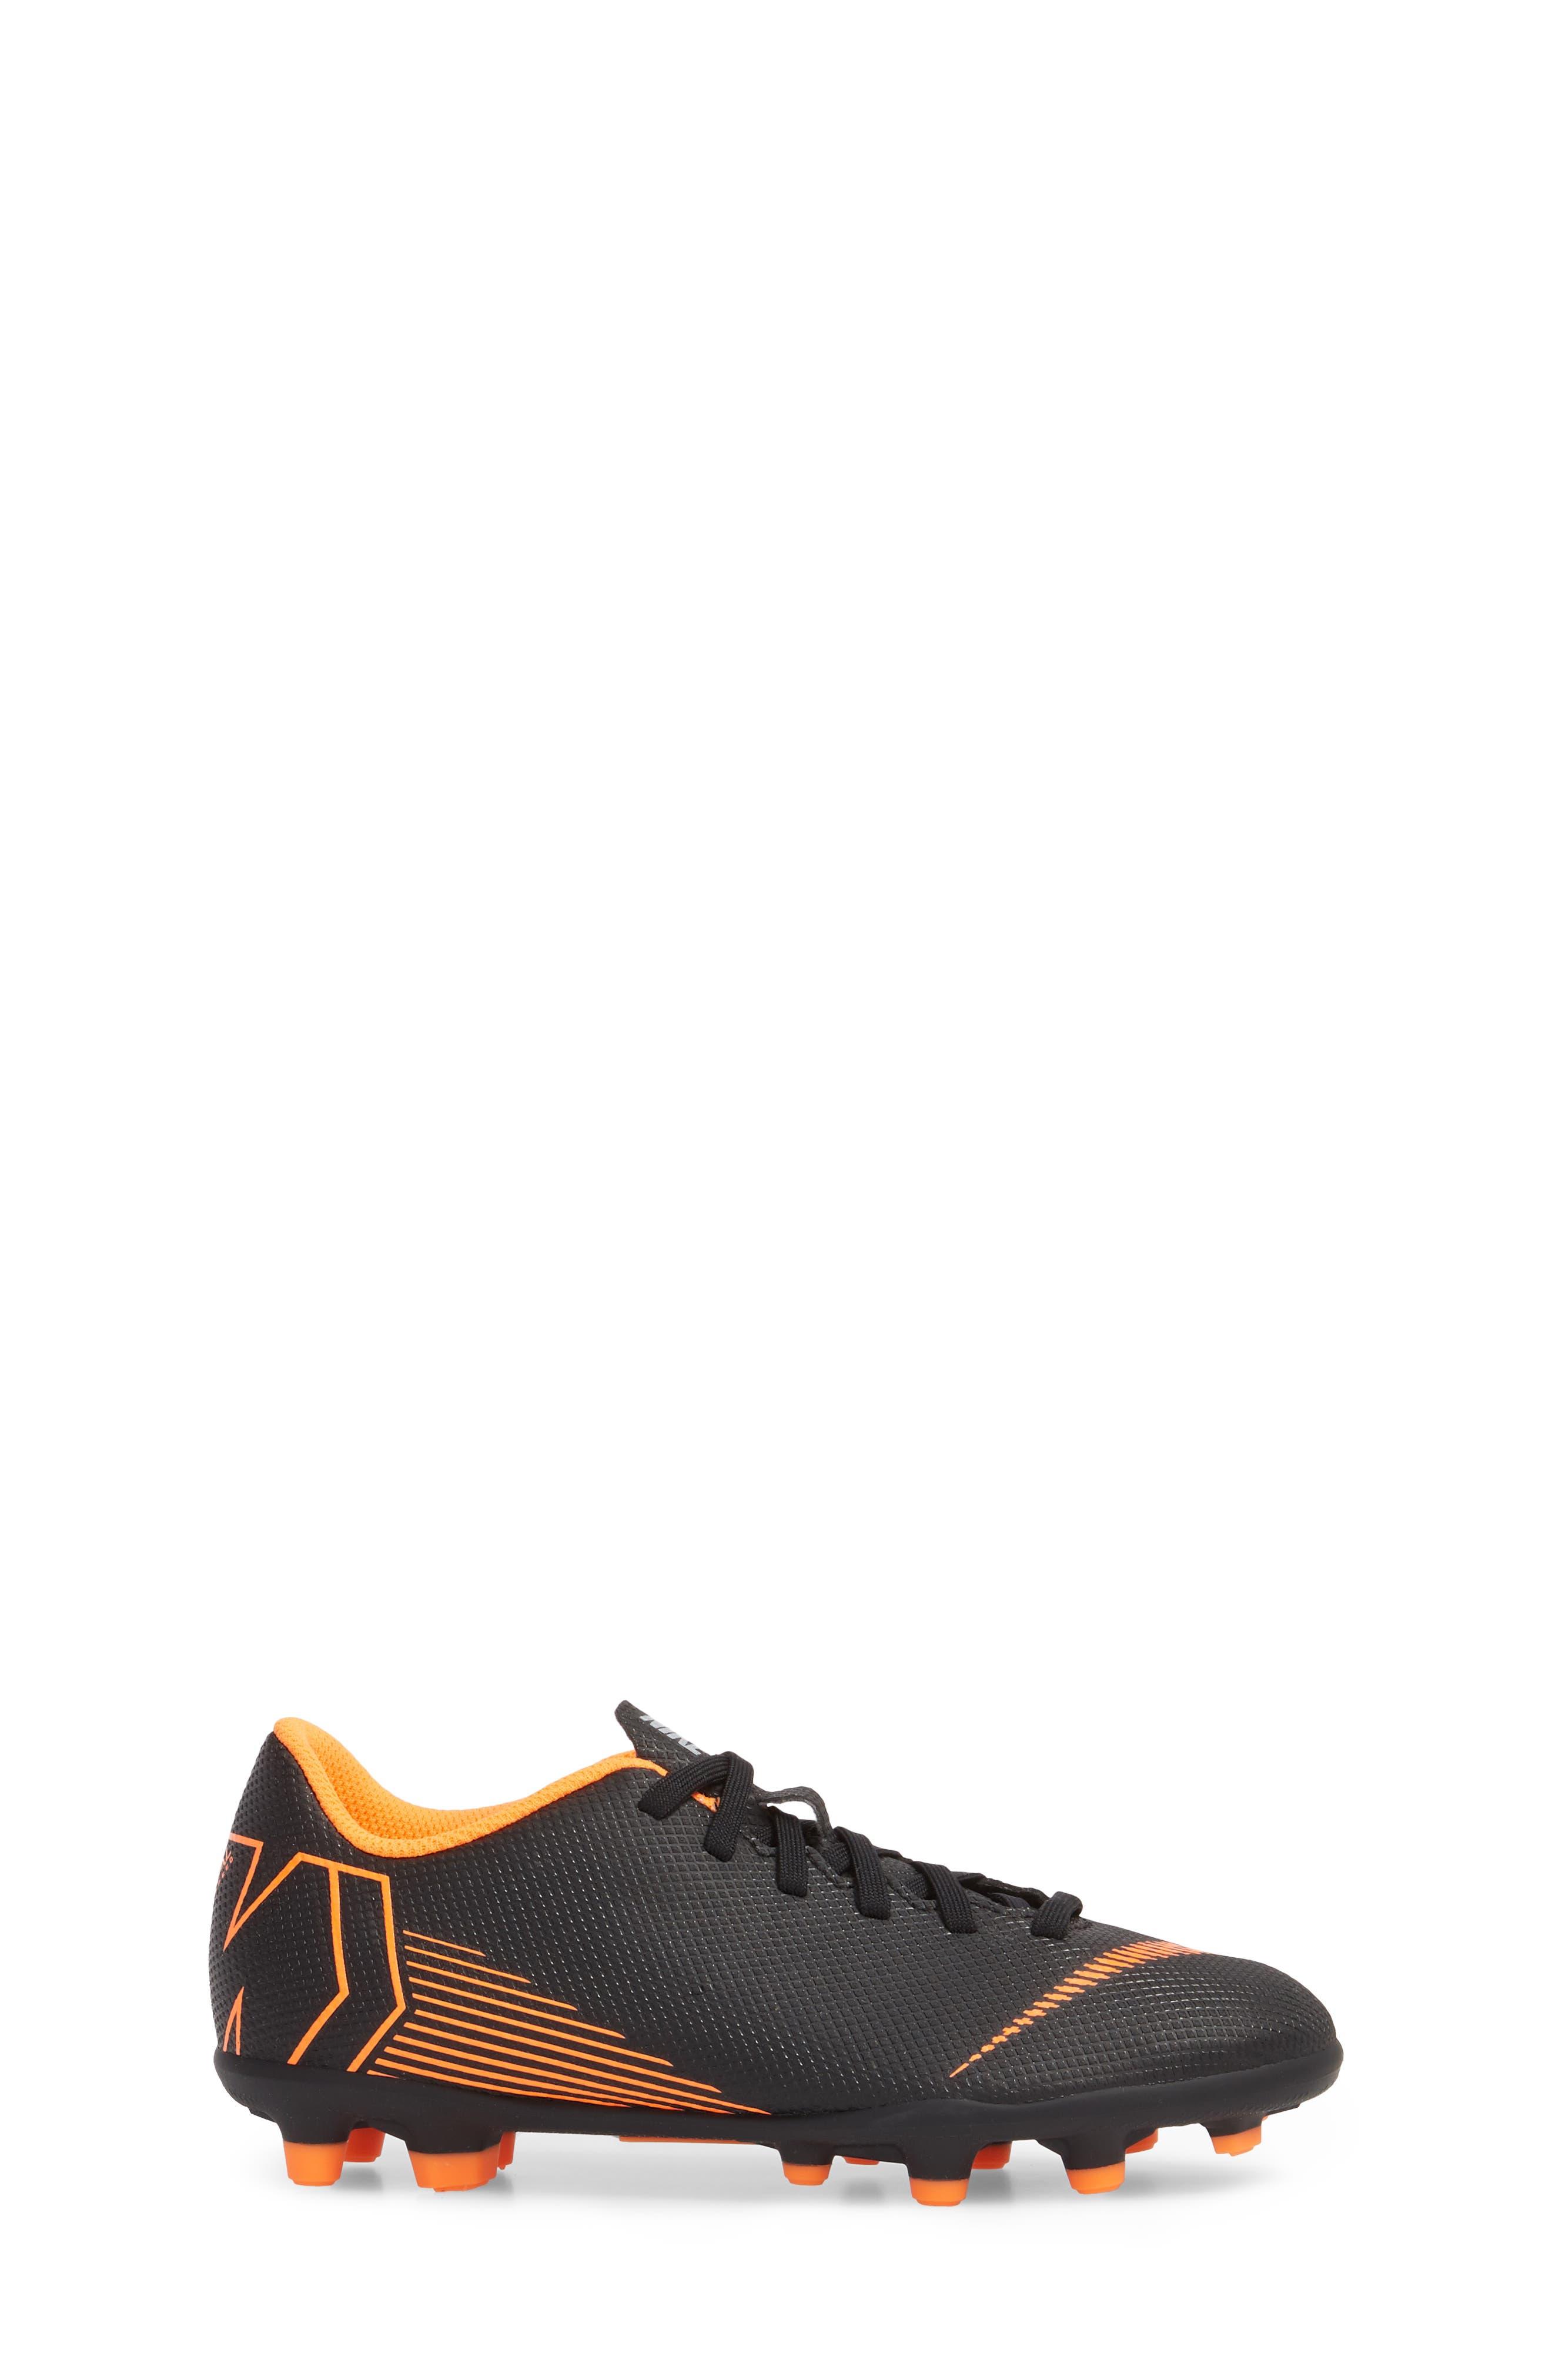 Vapor XII Club Multi Ground Soccer Shoe,                             Alternate thumbnail 3, color,                             004